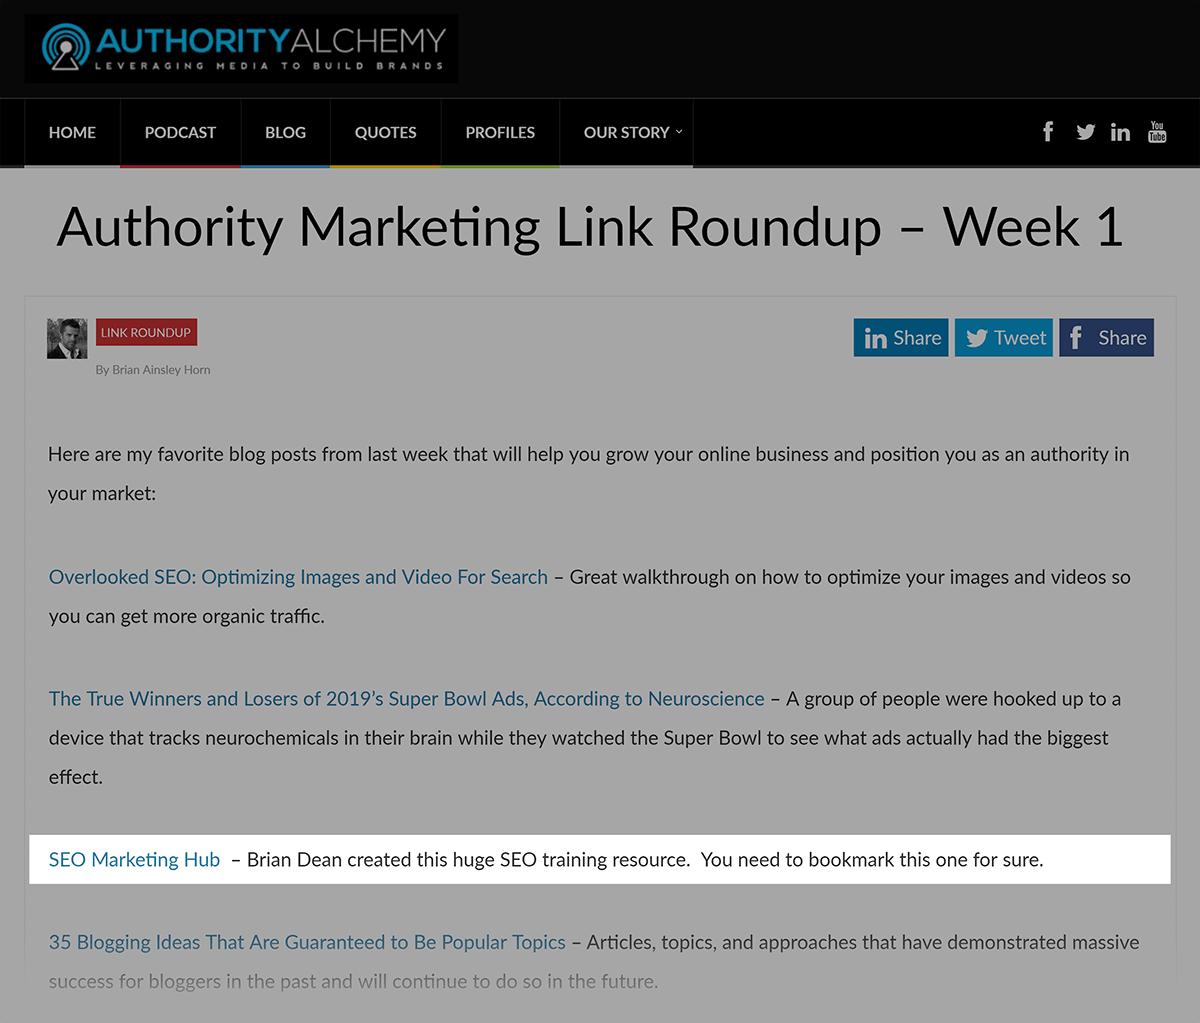 SEO Marketing Hub - Backlink from AuthorityAlchemy's link roundup